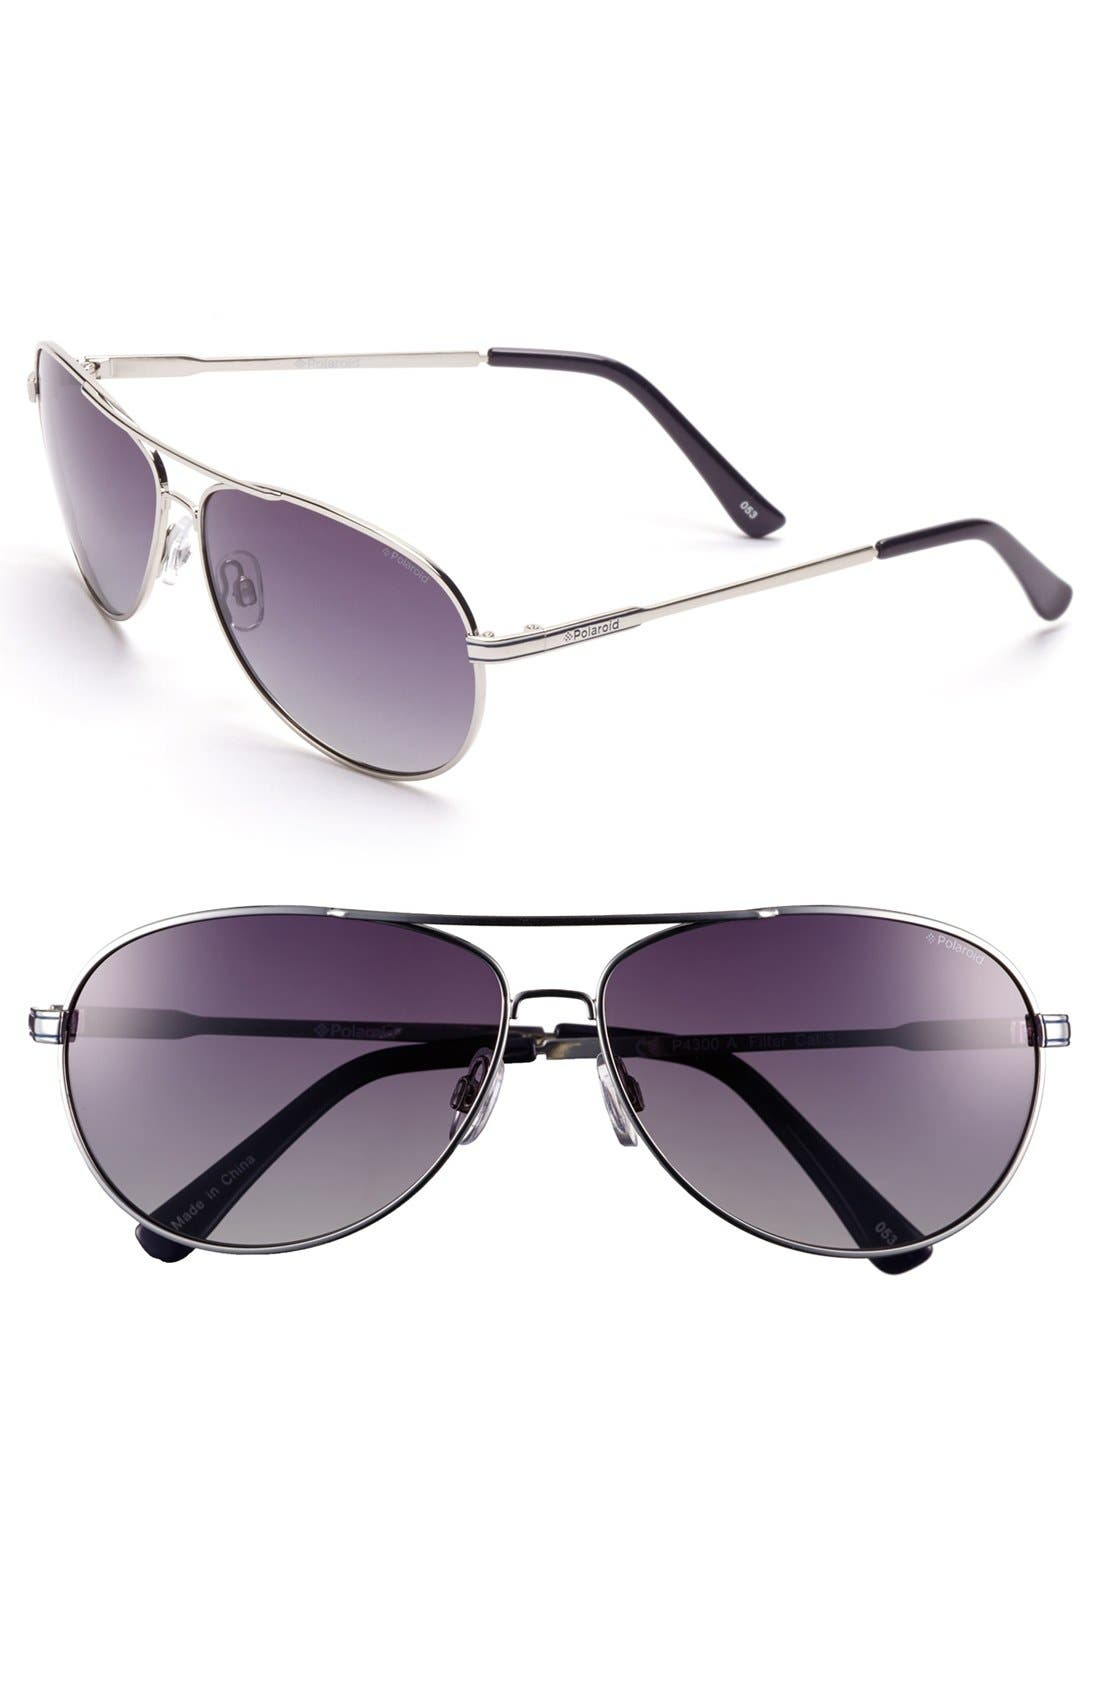 Main Image - Polaroid Eyewear 62mm Polarized Aviator Sunglasses